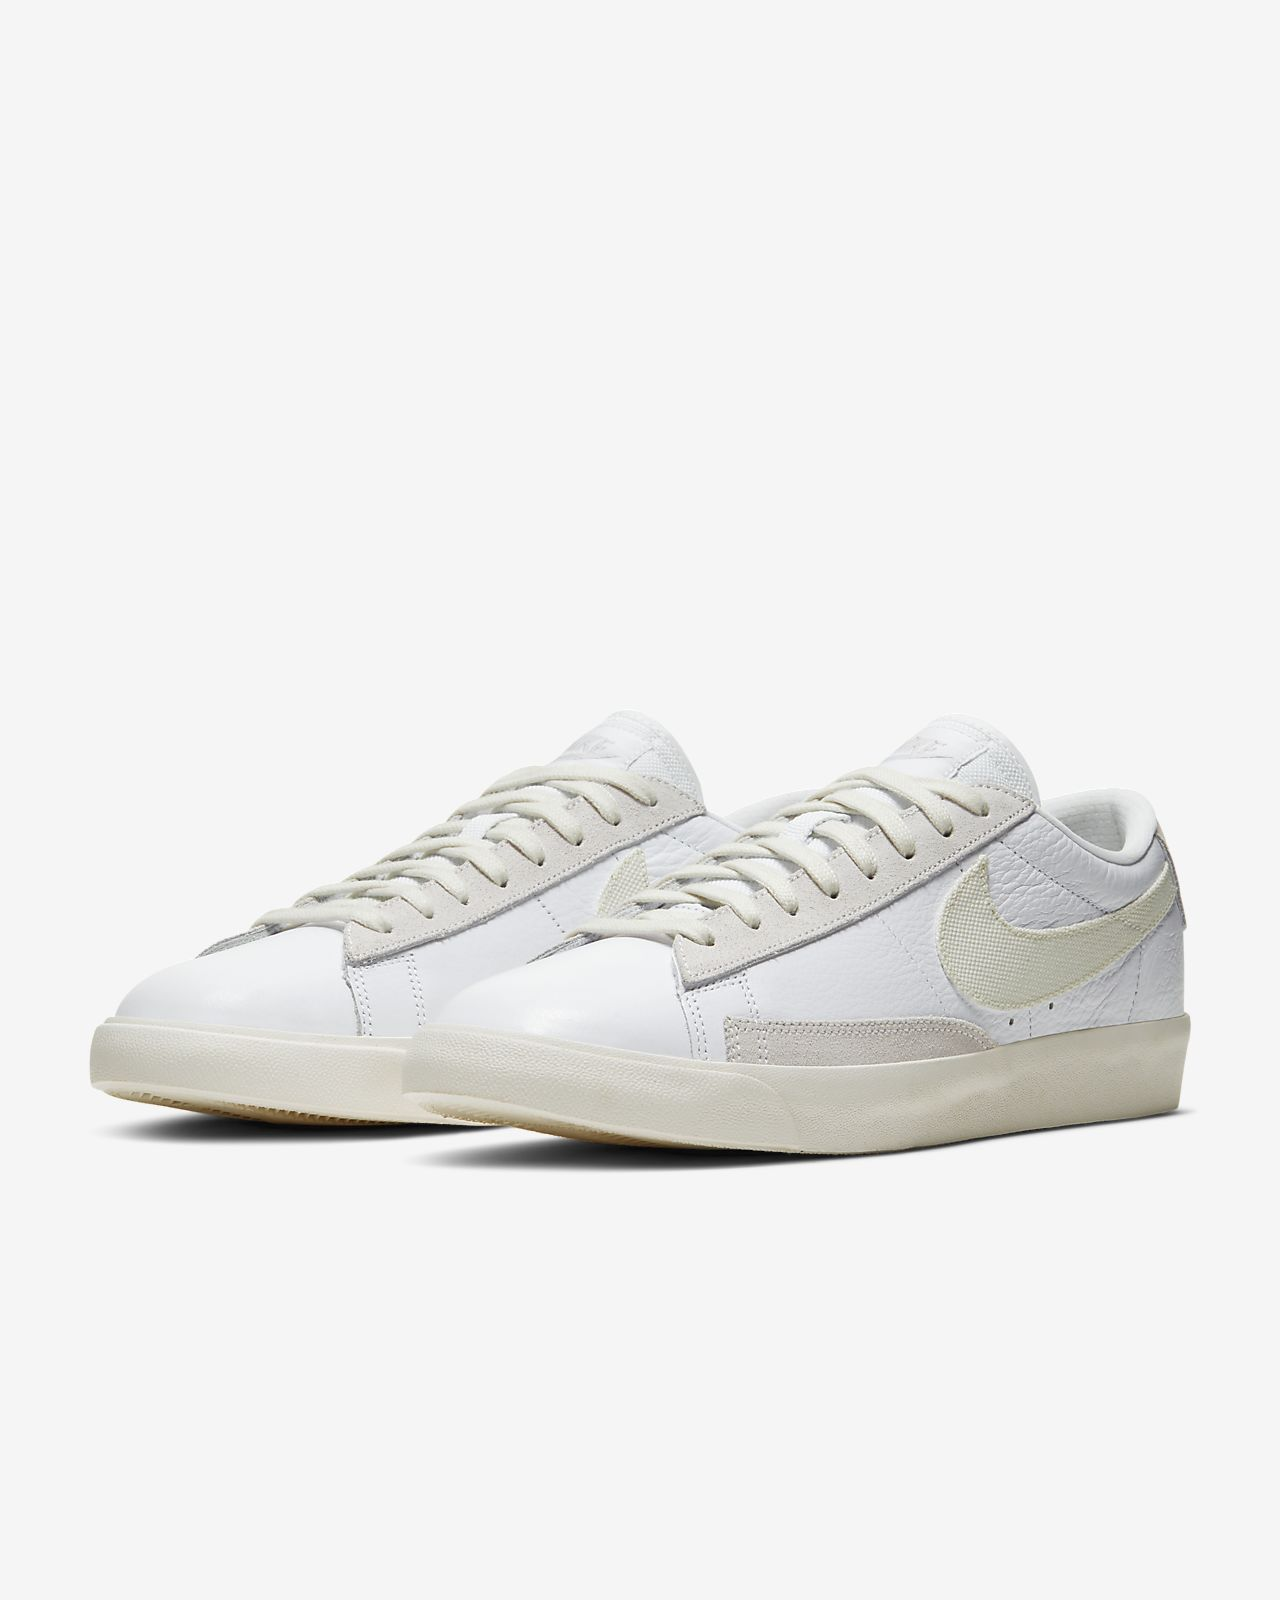 Chaussure Nike Blazer Low Leather